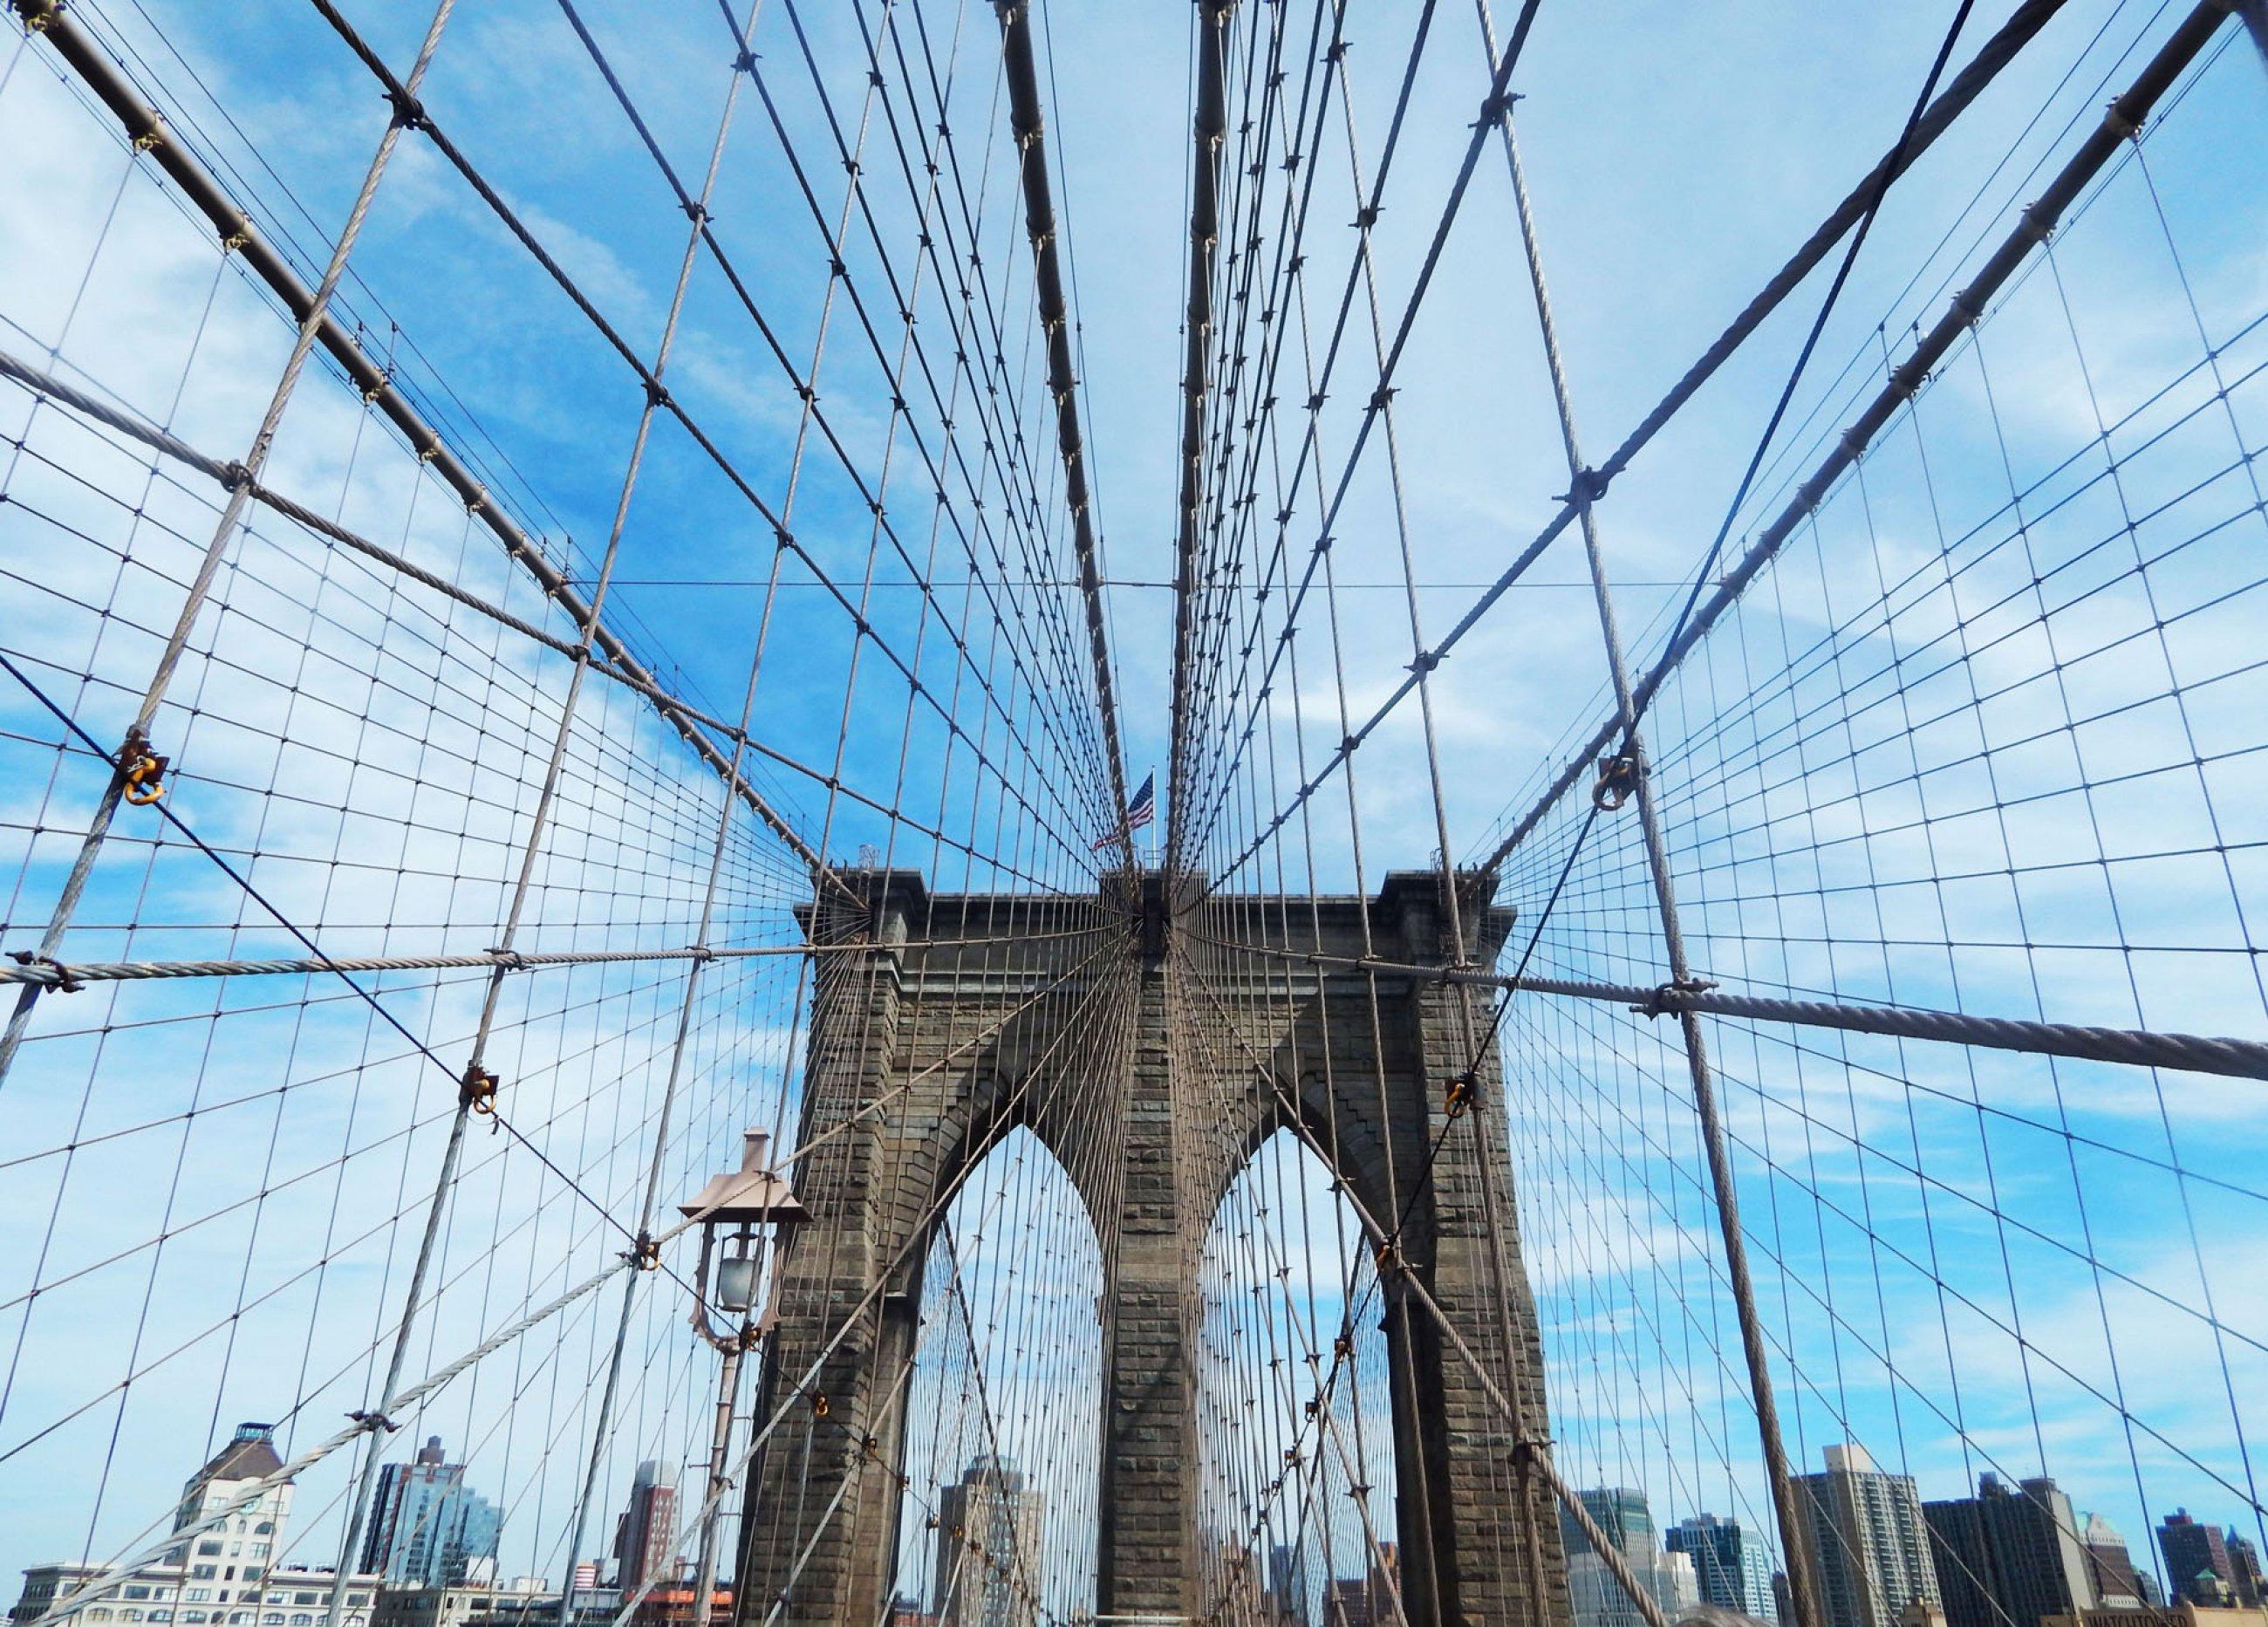 https://bubo.sk/uploads/galleries/4326/ny-beyond-the-bridge.jpg